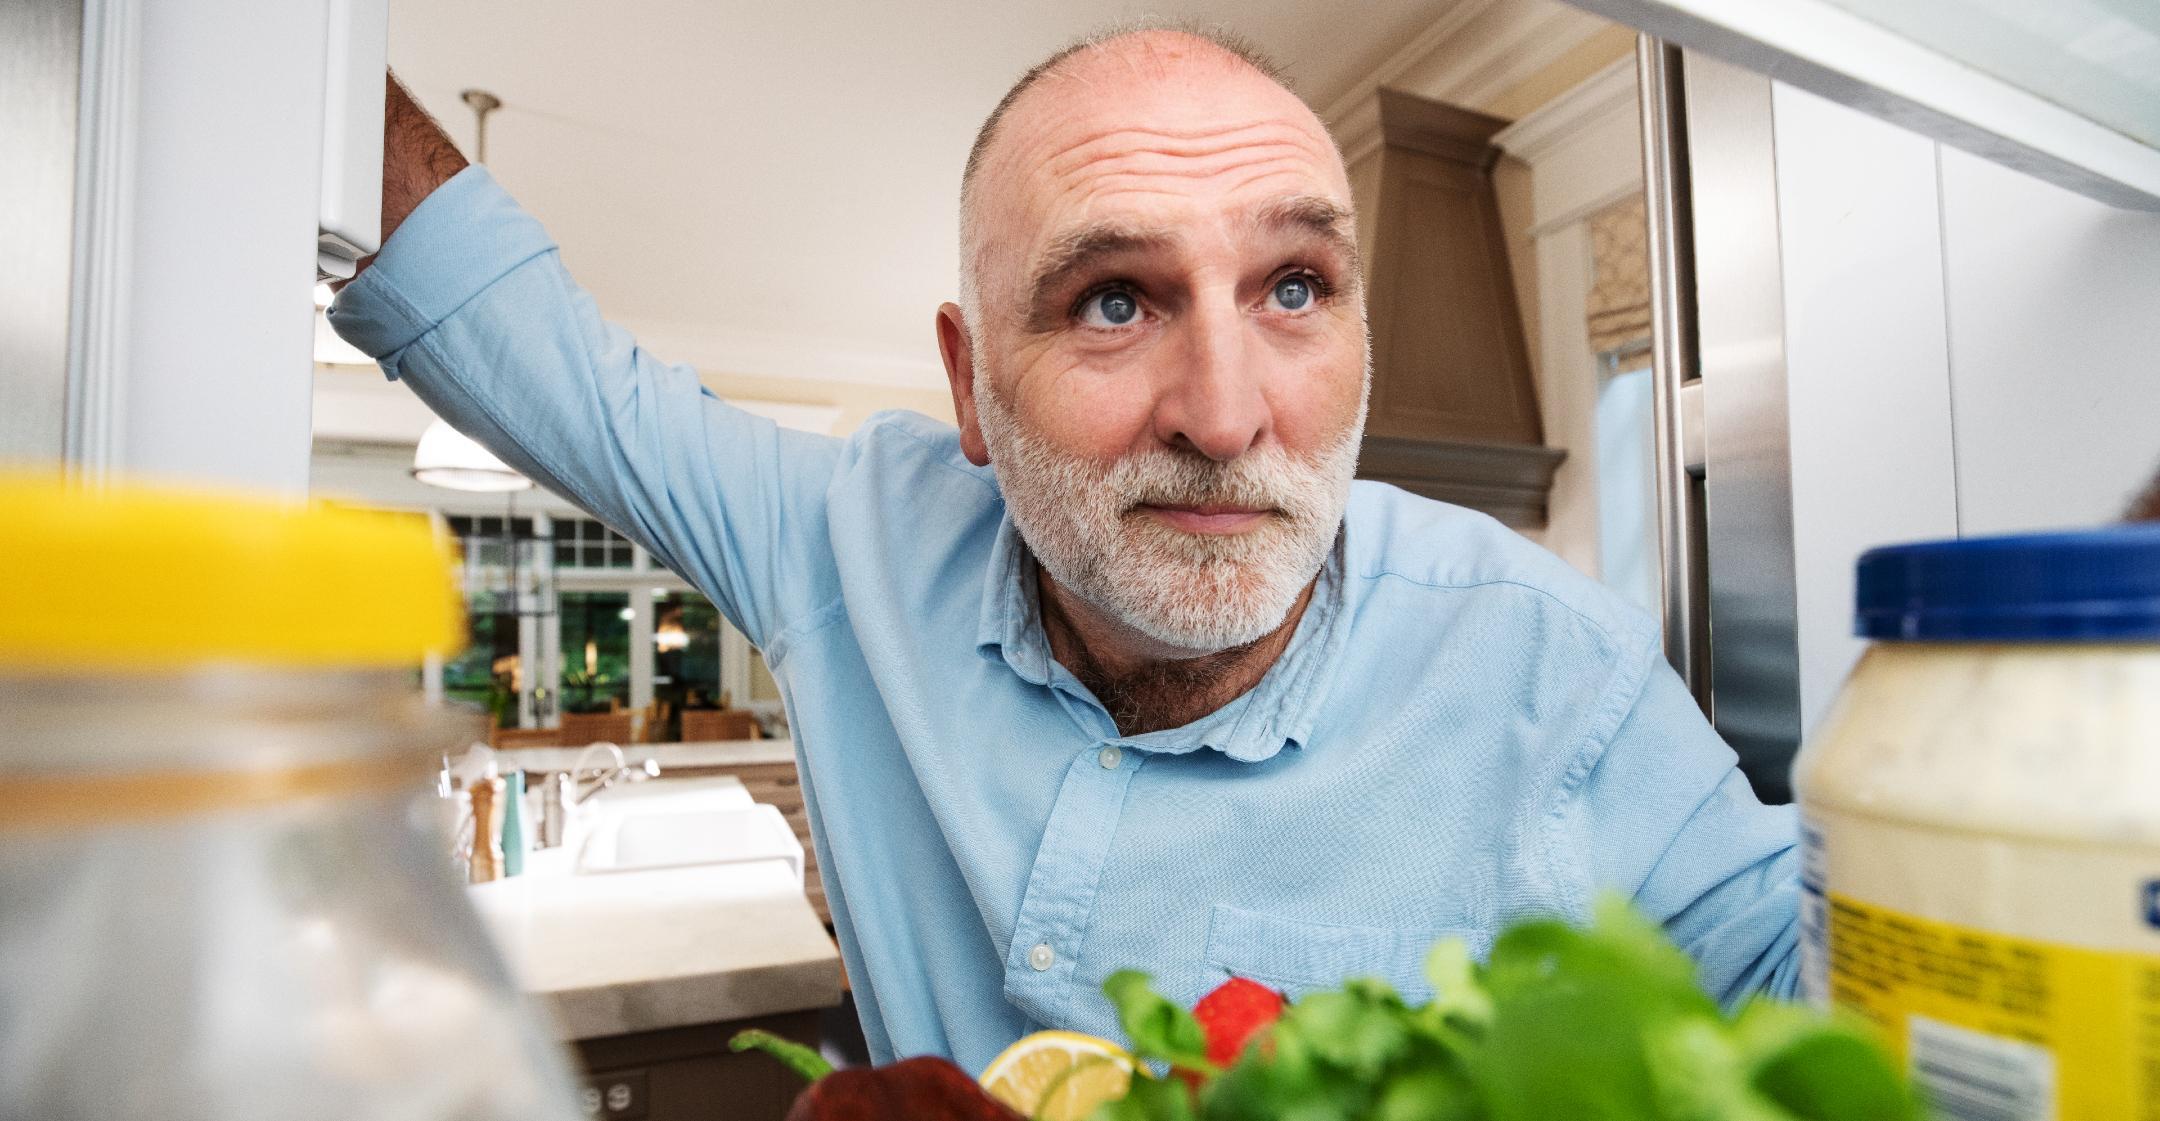 chef jose andres tackling food waste fridge hunters initiative